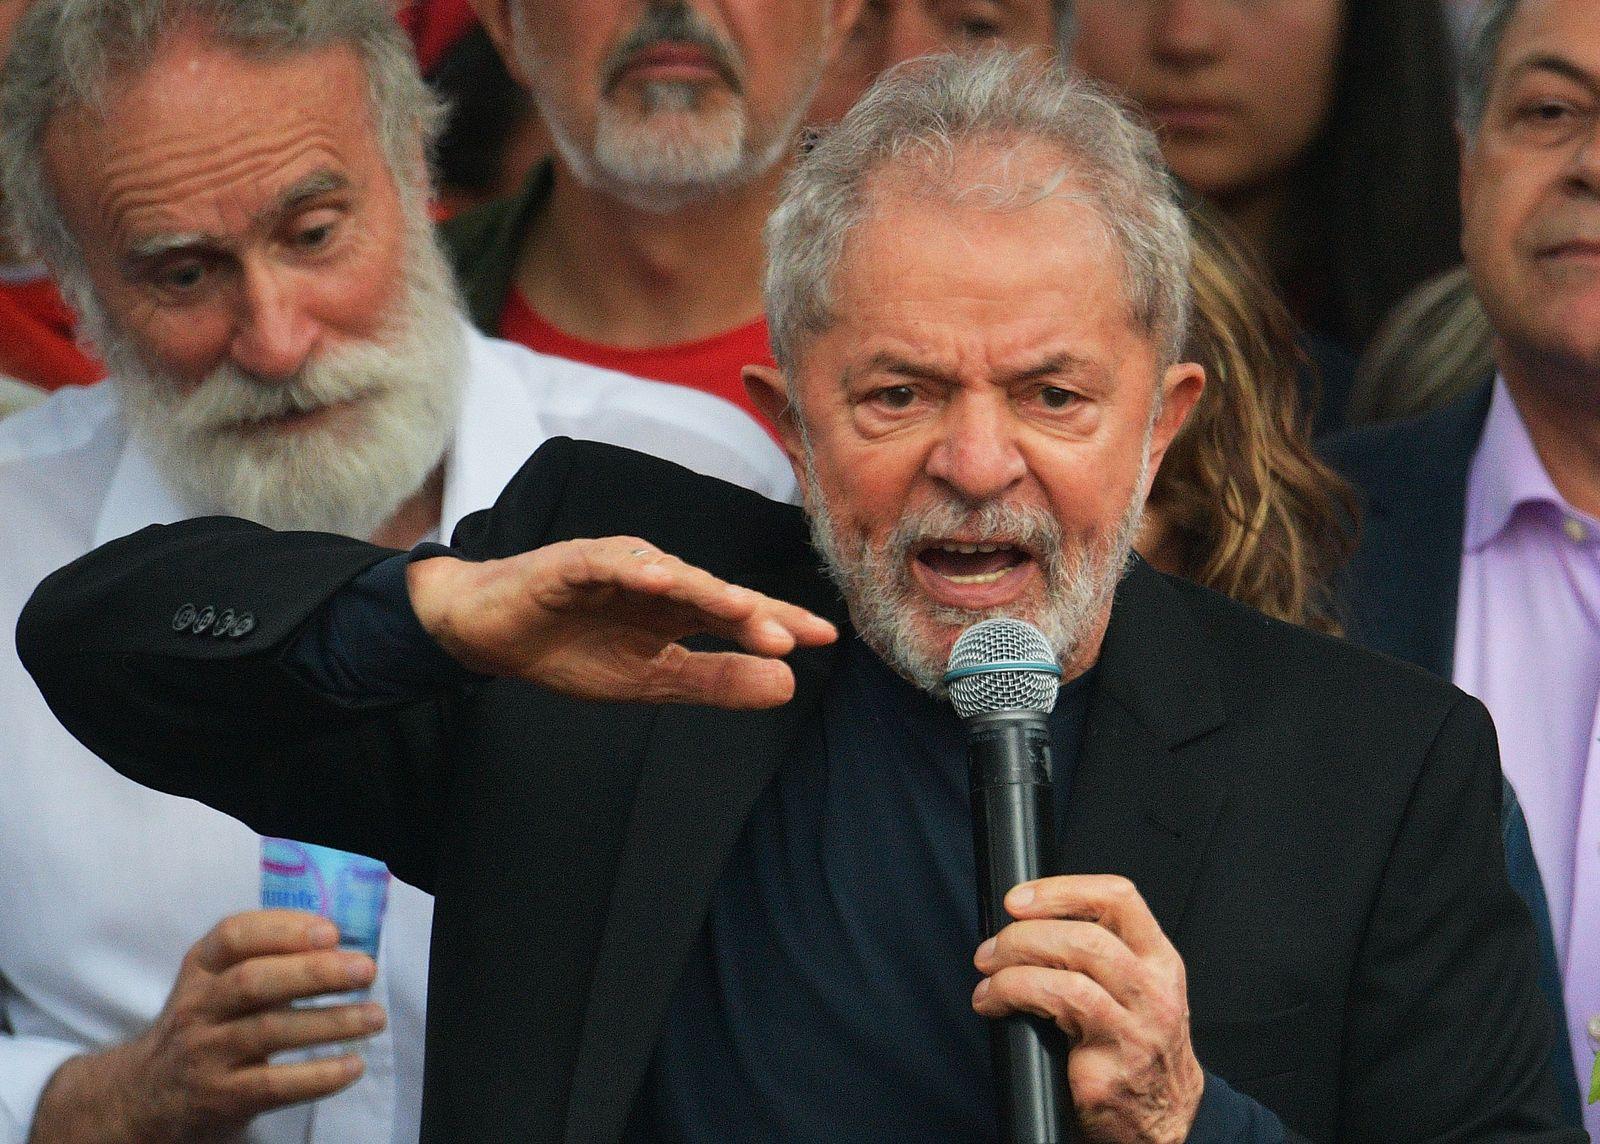 BRAZIL-JUSTICE-LULA DA SILVA-RELEASE